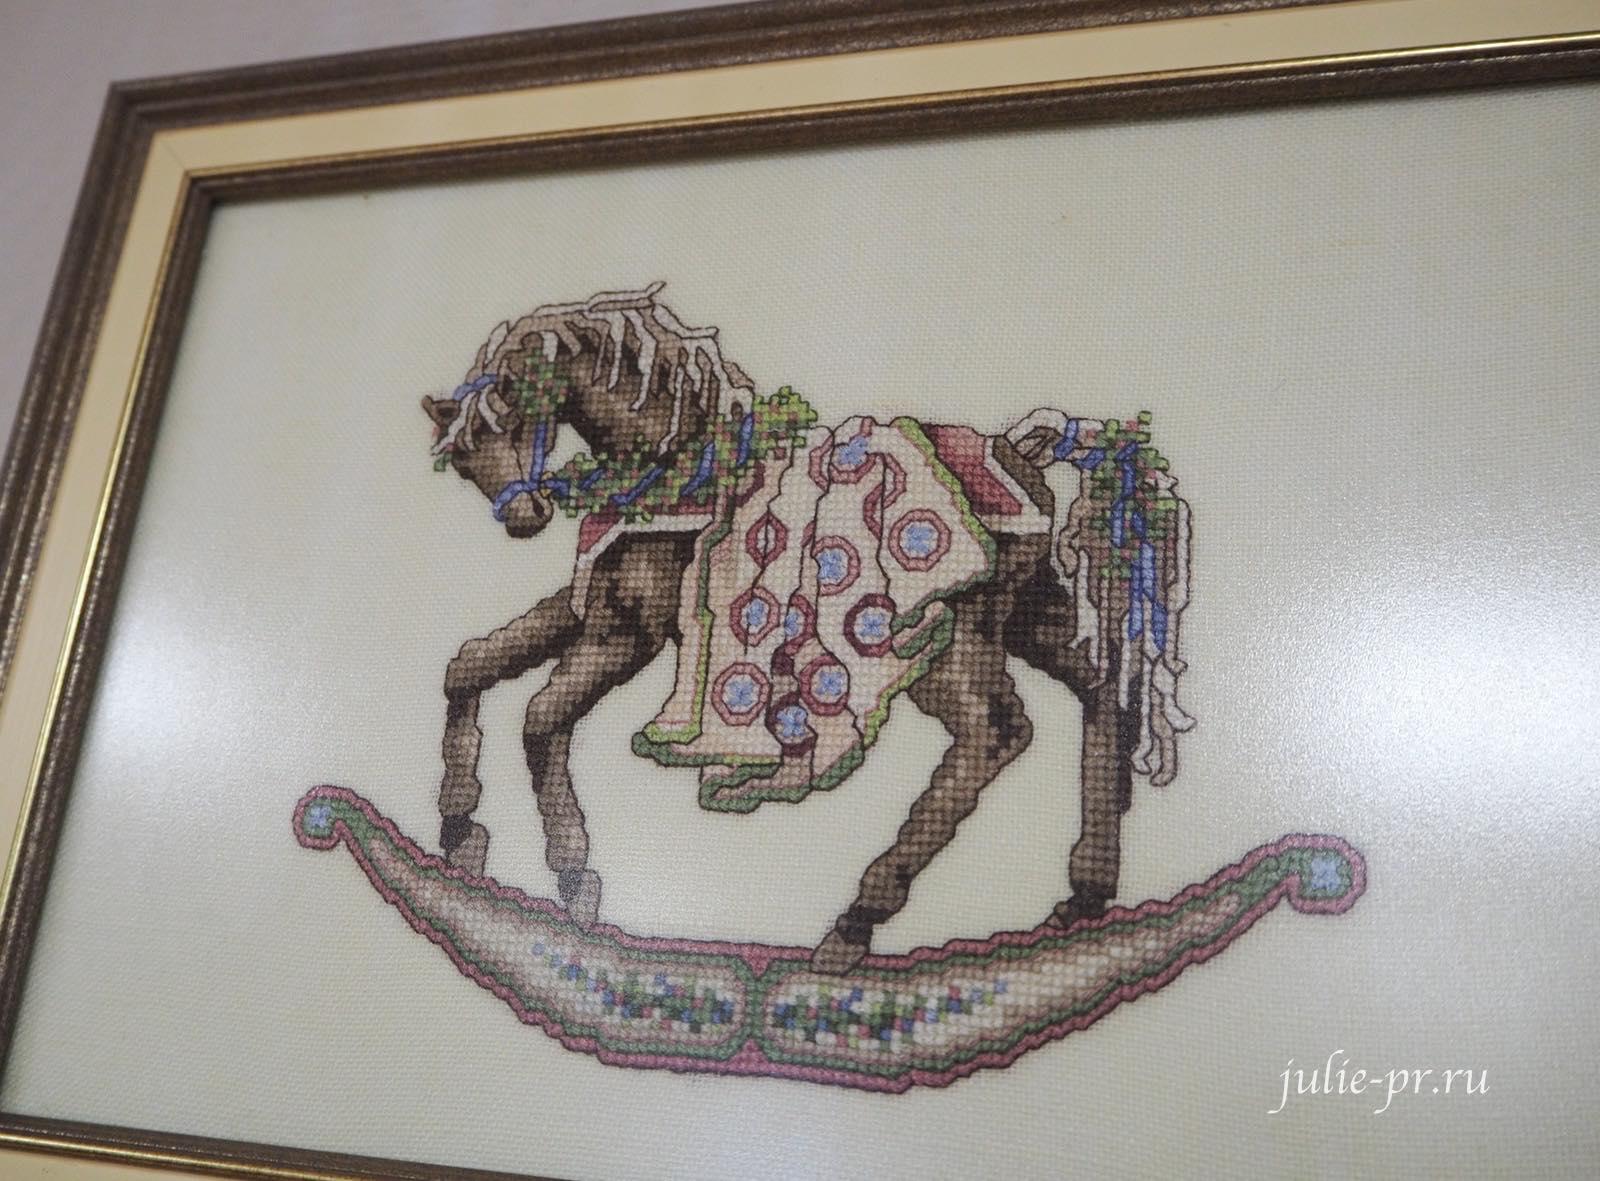 Teresa Wentzler, Тереза Венцлер, вышивка крестом, Rocking Horses, Лошадки-качалки